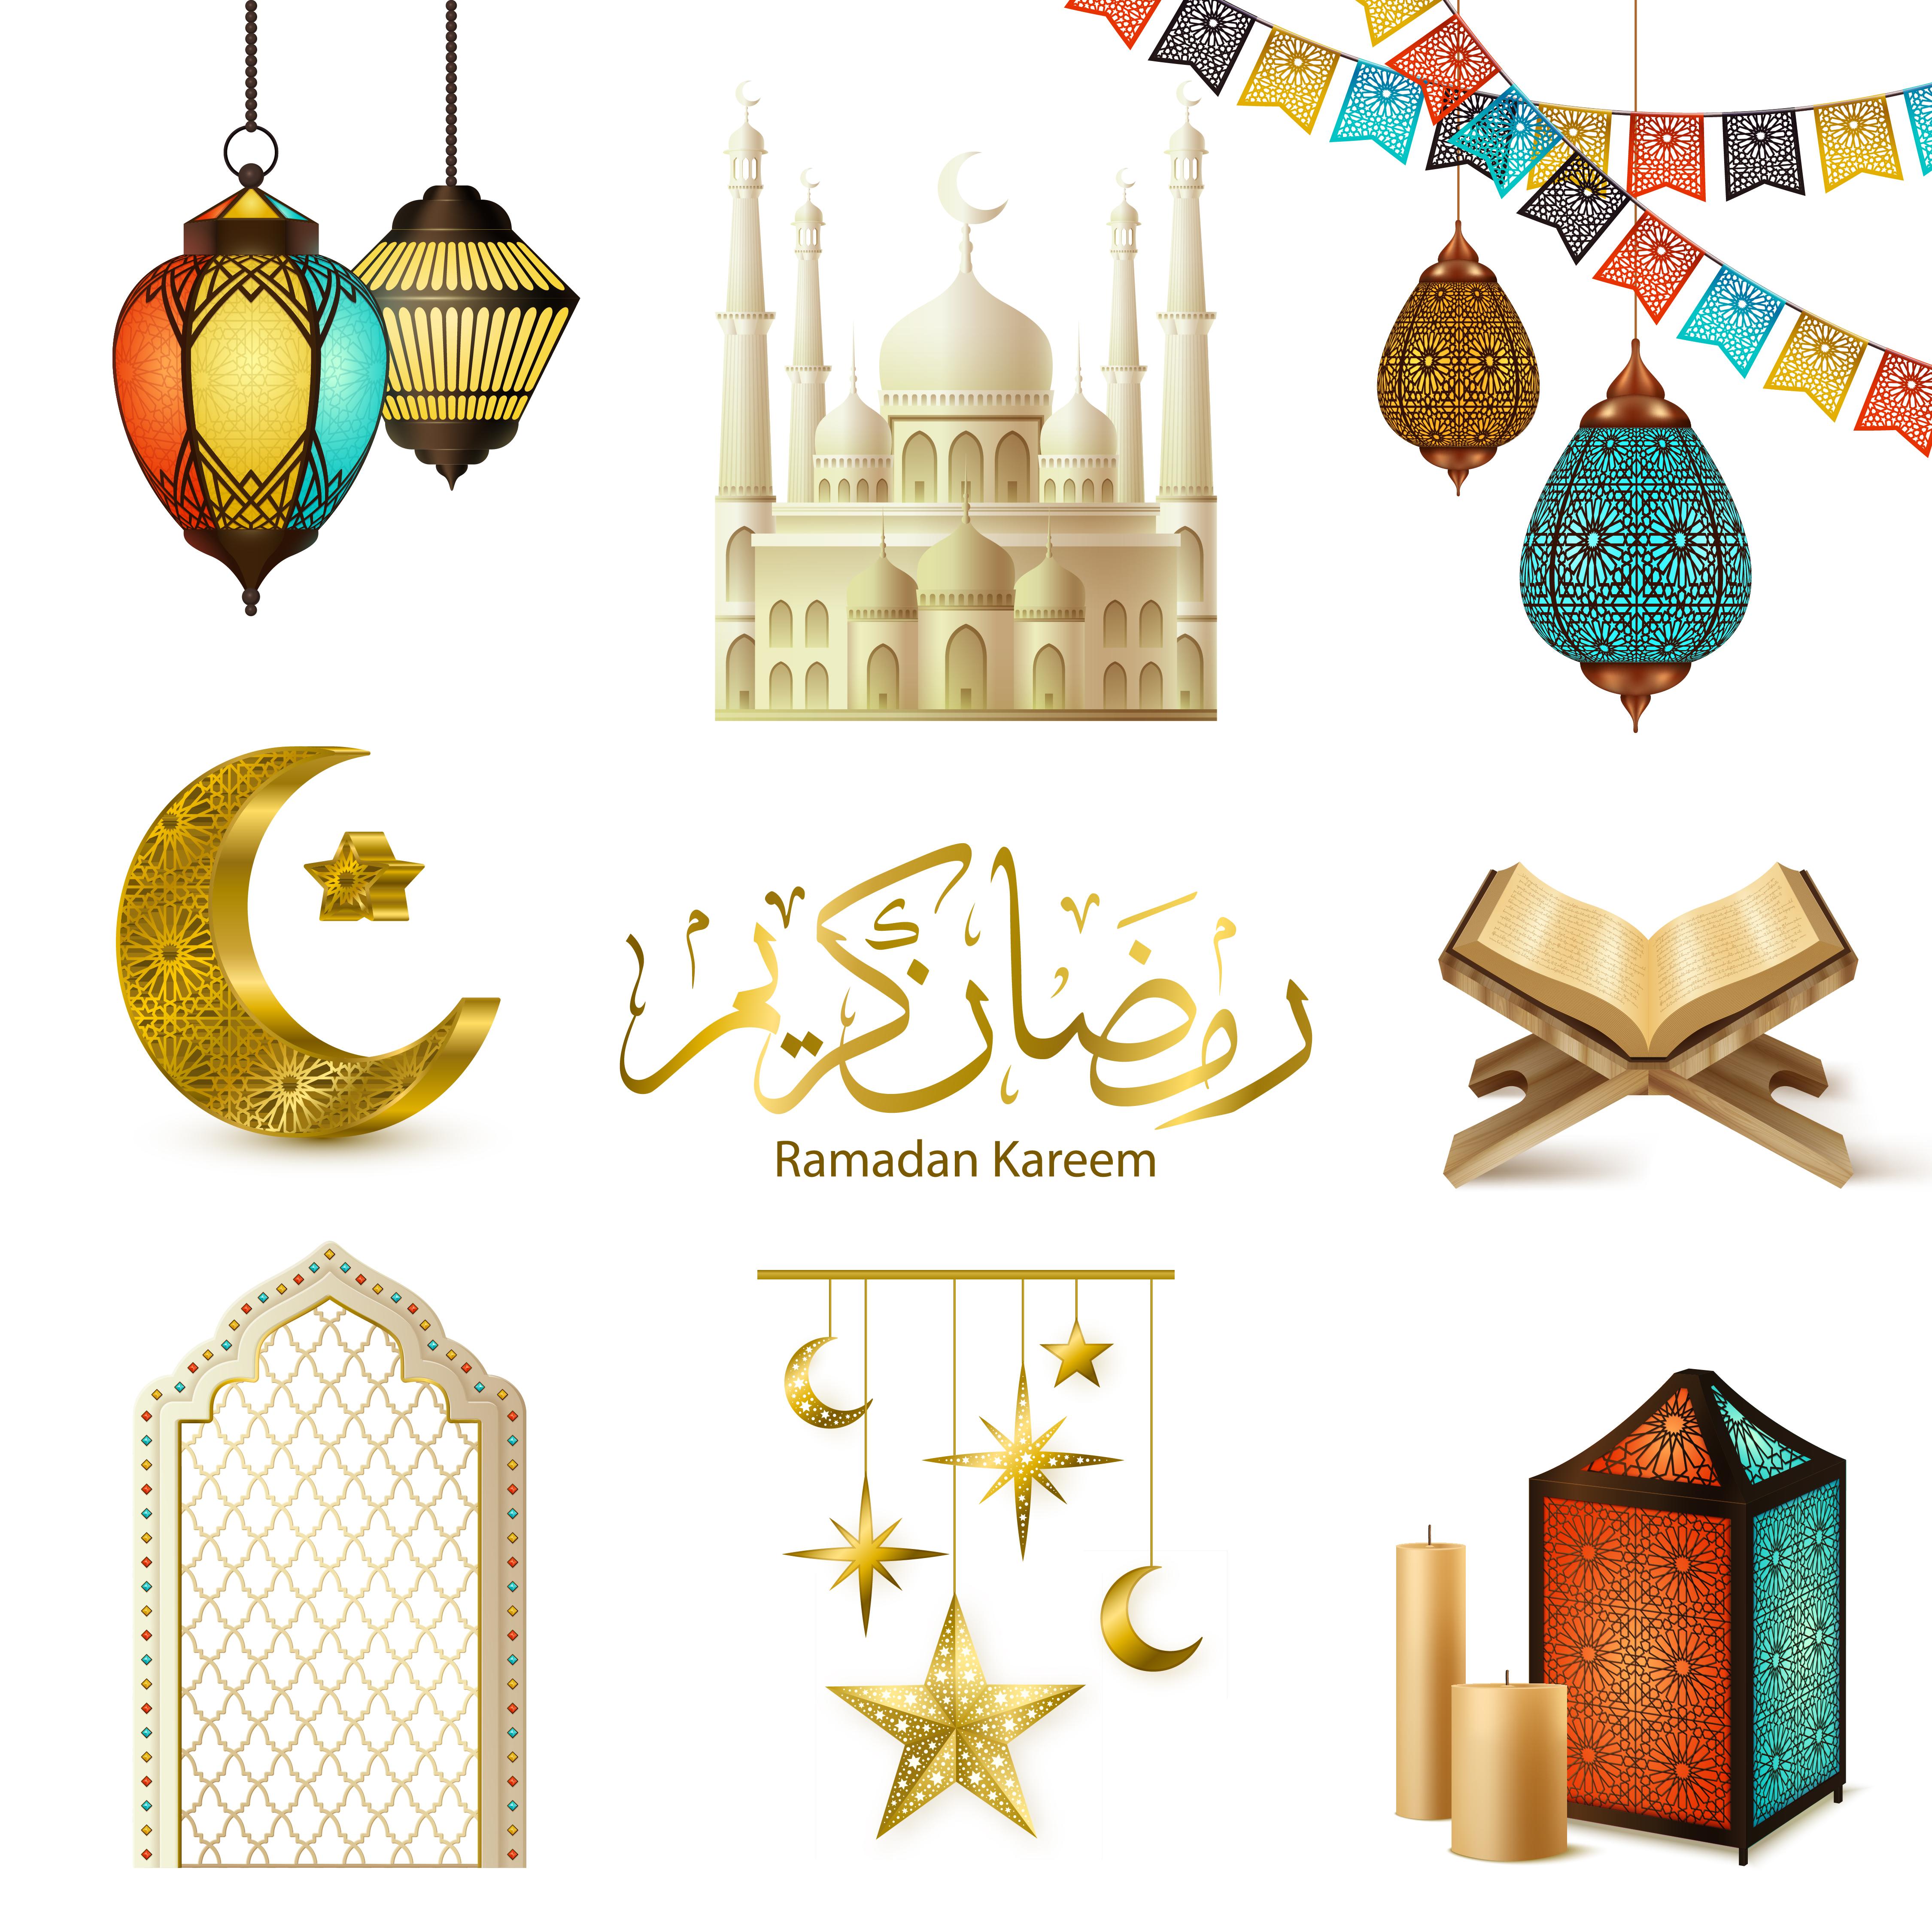 Ramadan 2020 - When is Ramadan 2020?